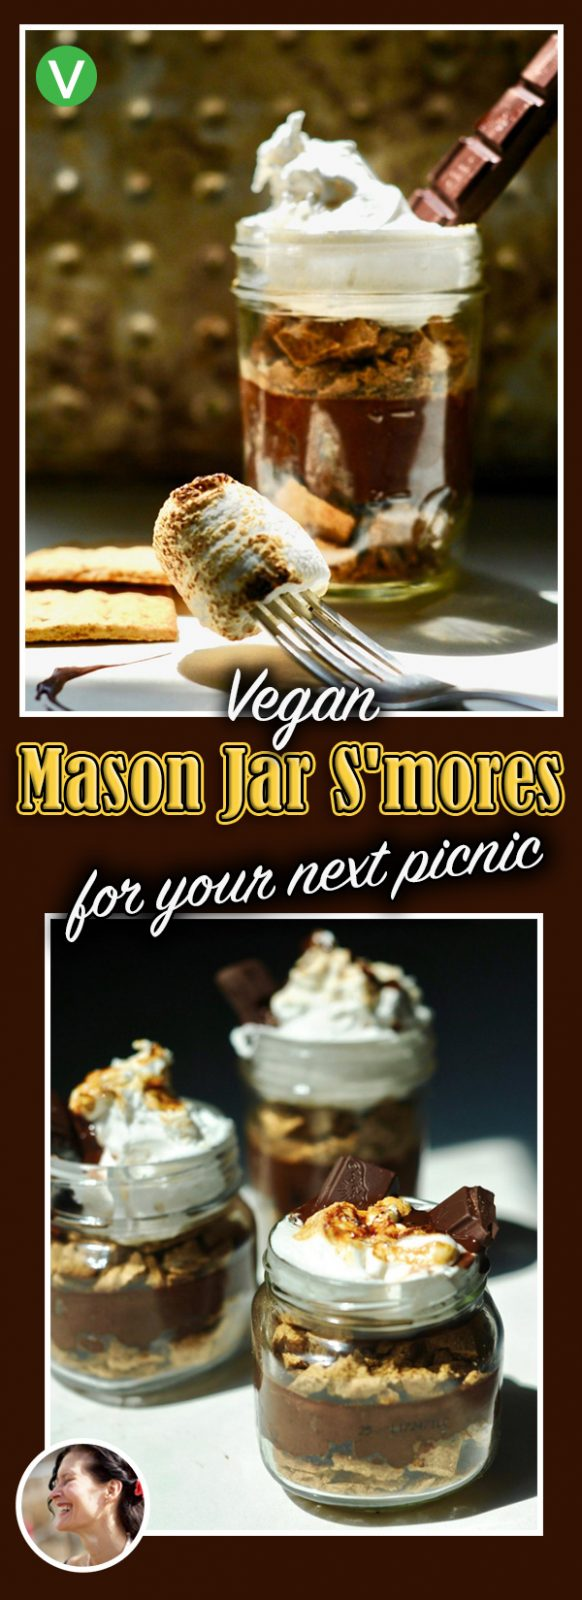 Vegan Mason Jar S'mores for your Next Picnic